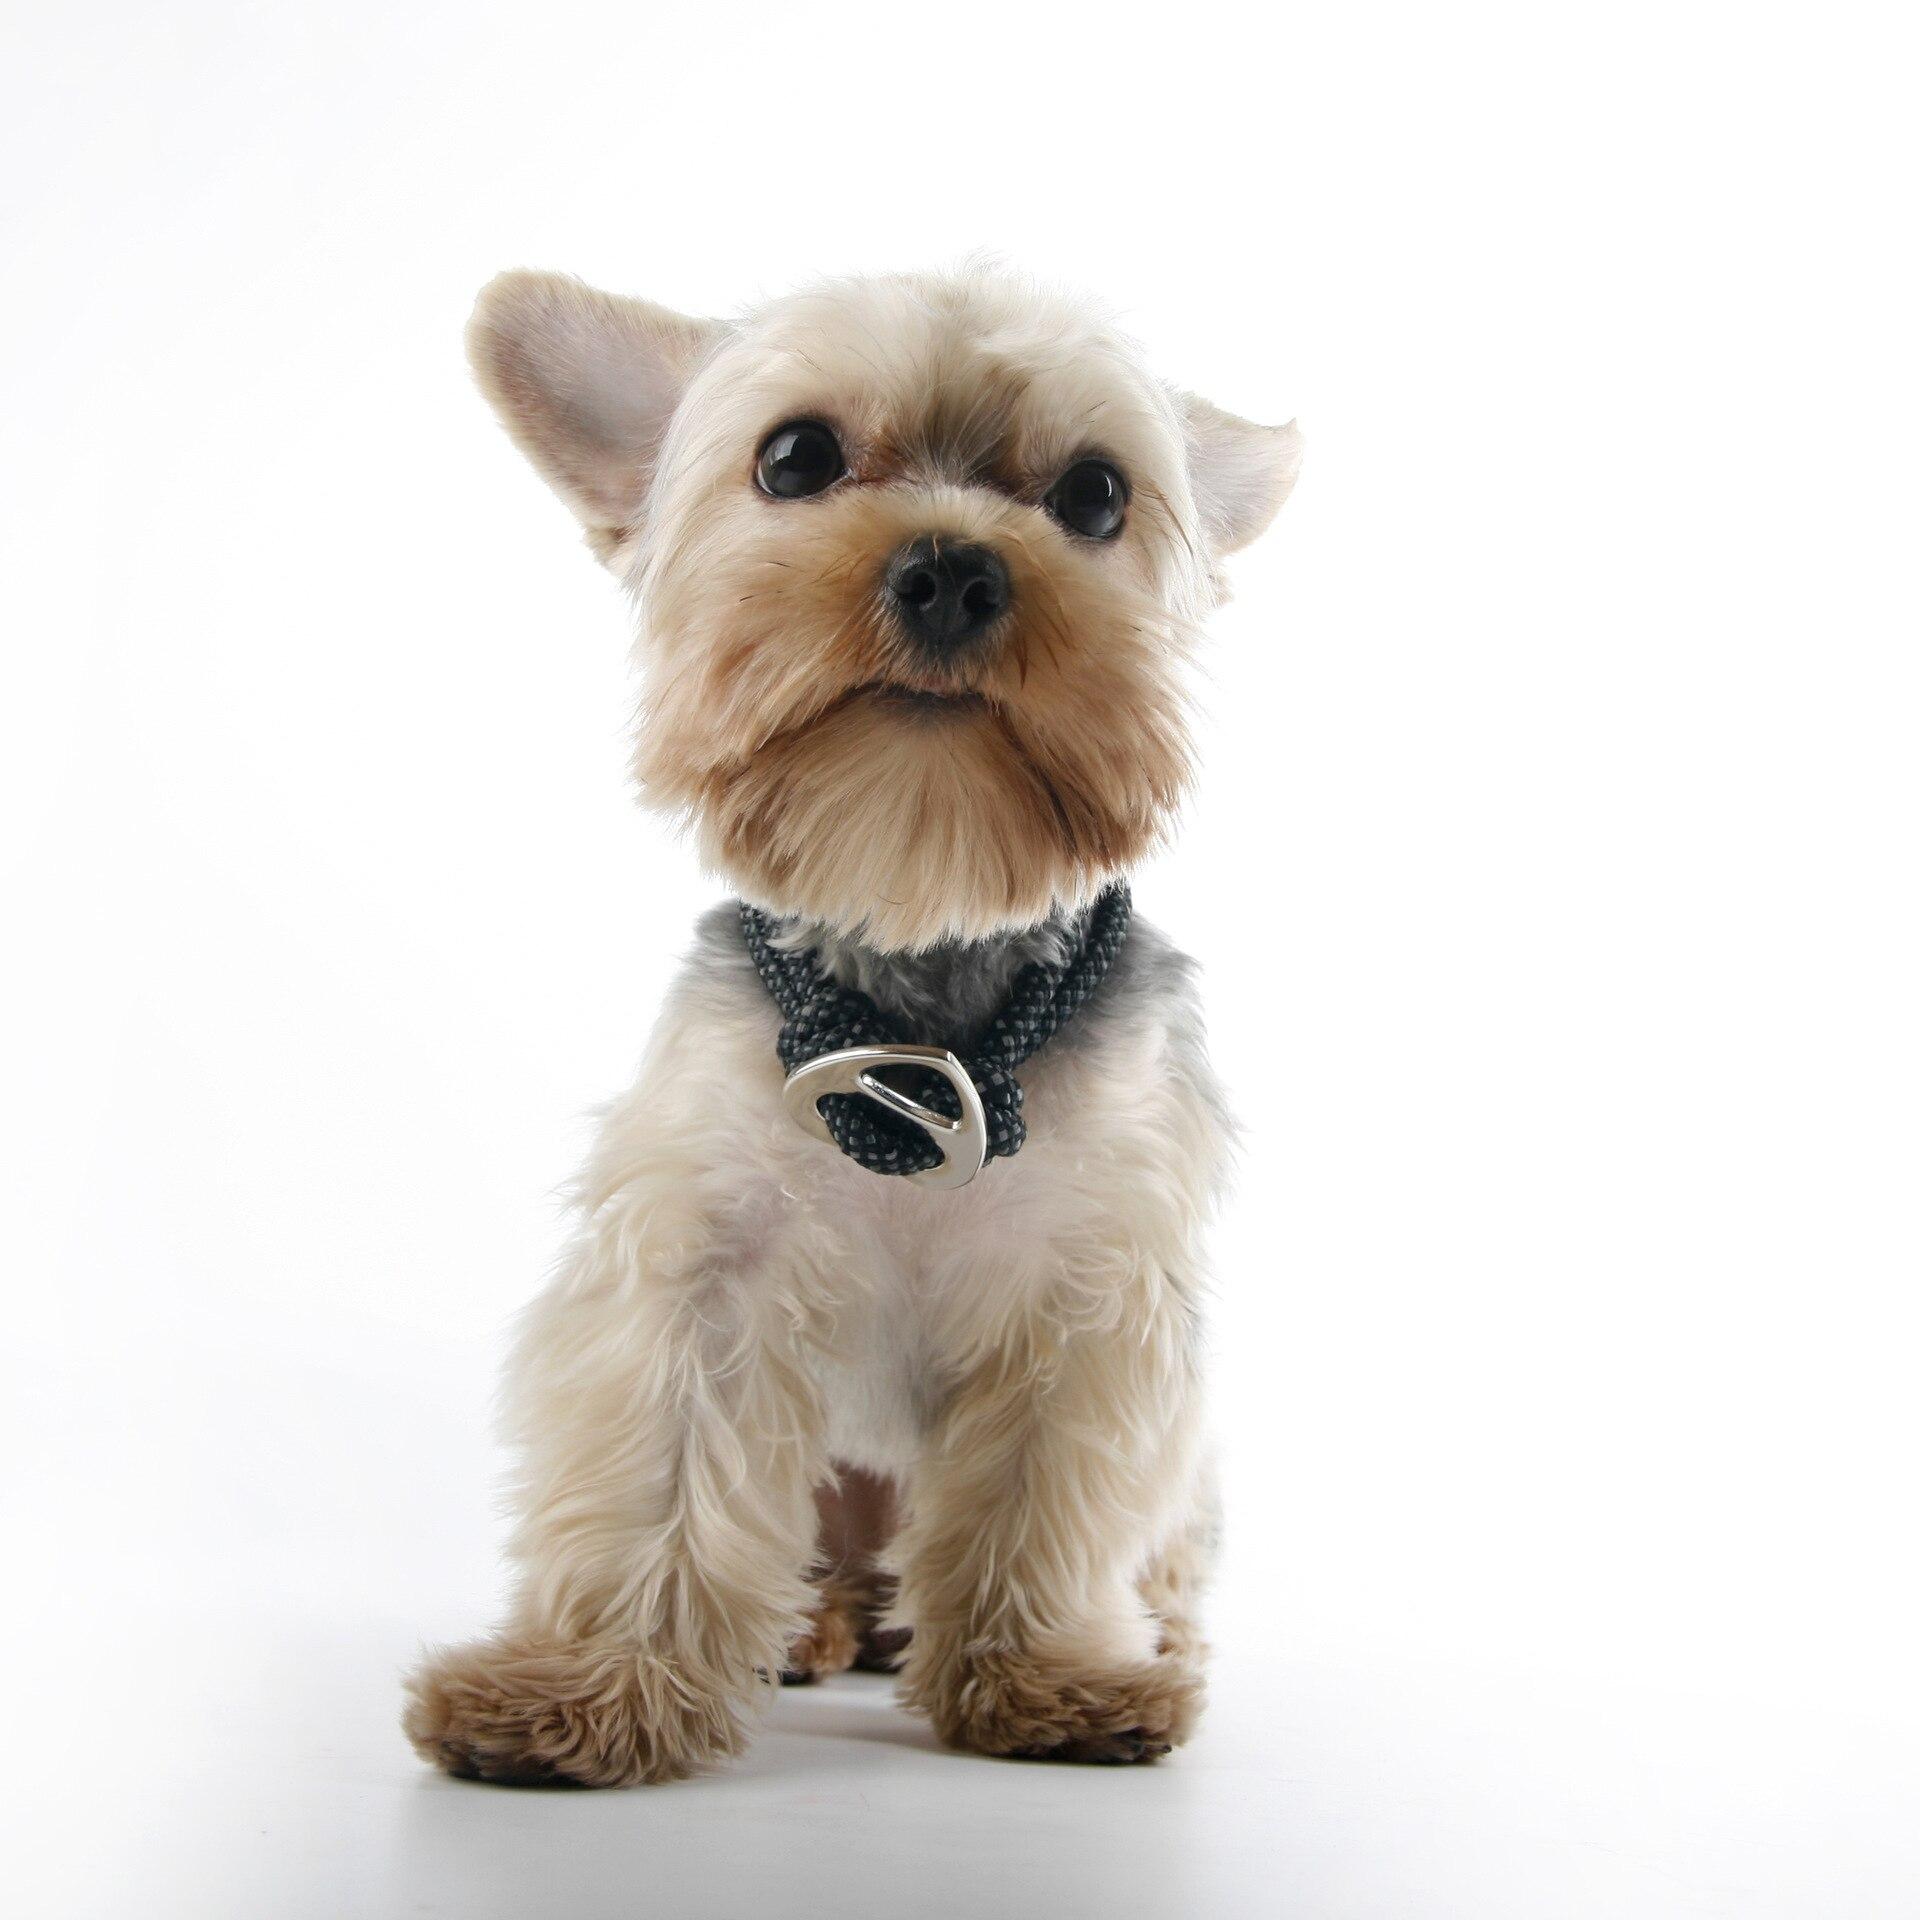 Doogee Pet Knot Heart DOG'S Head Hand Holding Rope Dog Neck Ring Labrador Schnauzer Handsome Bowtie